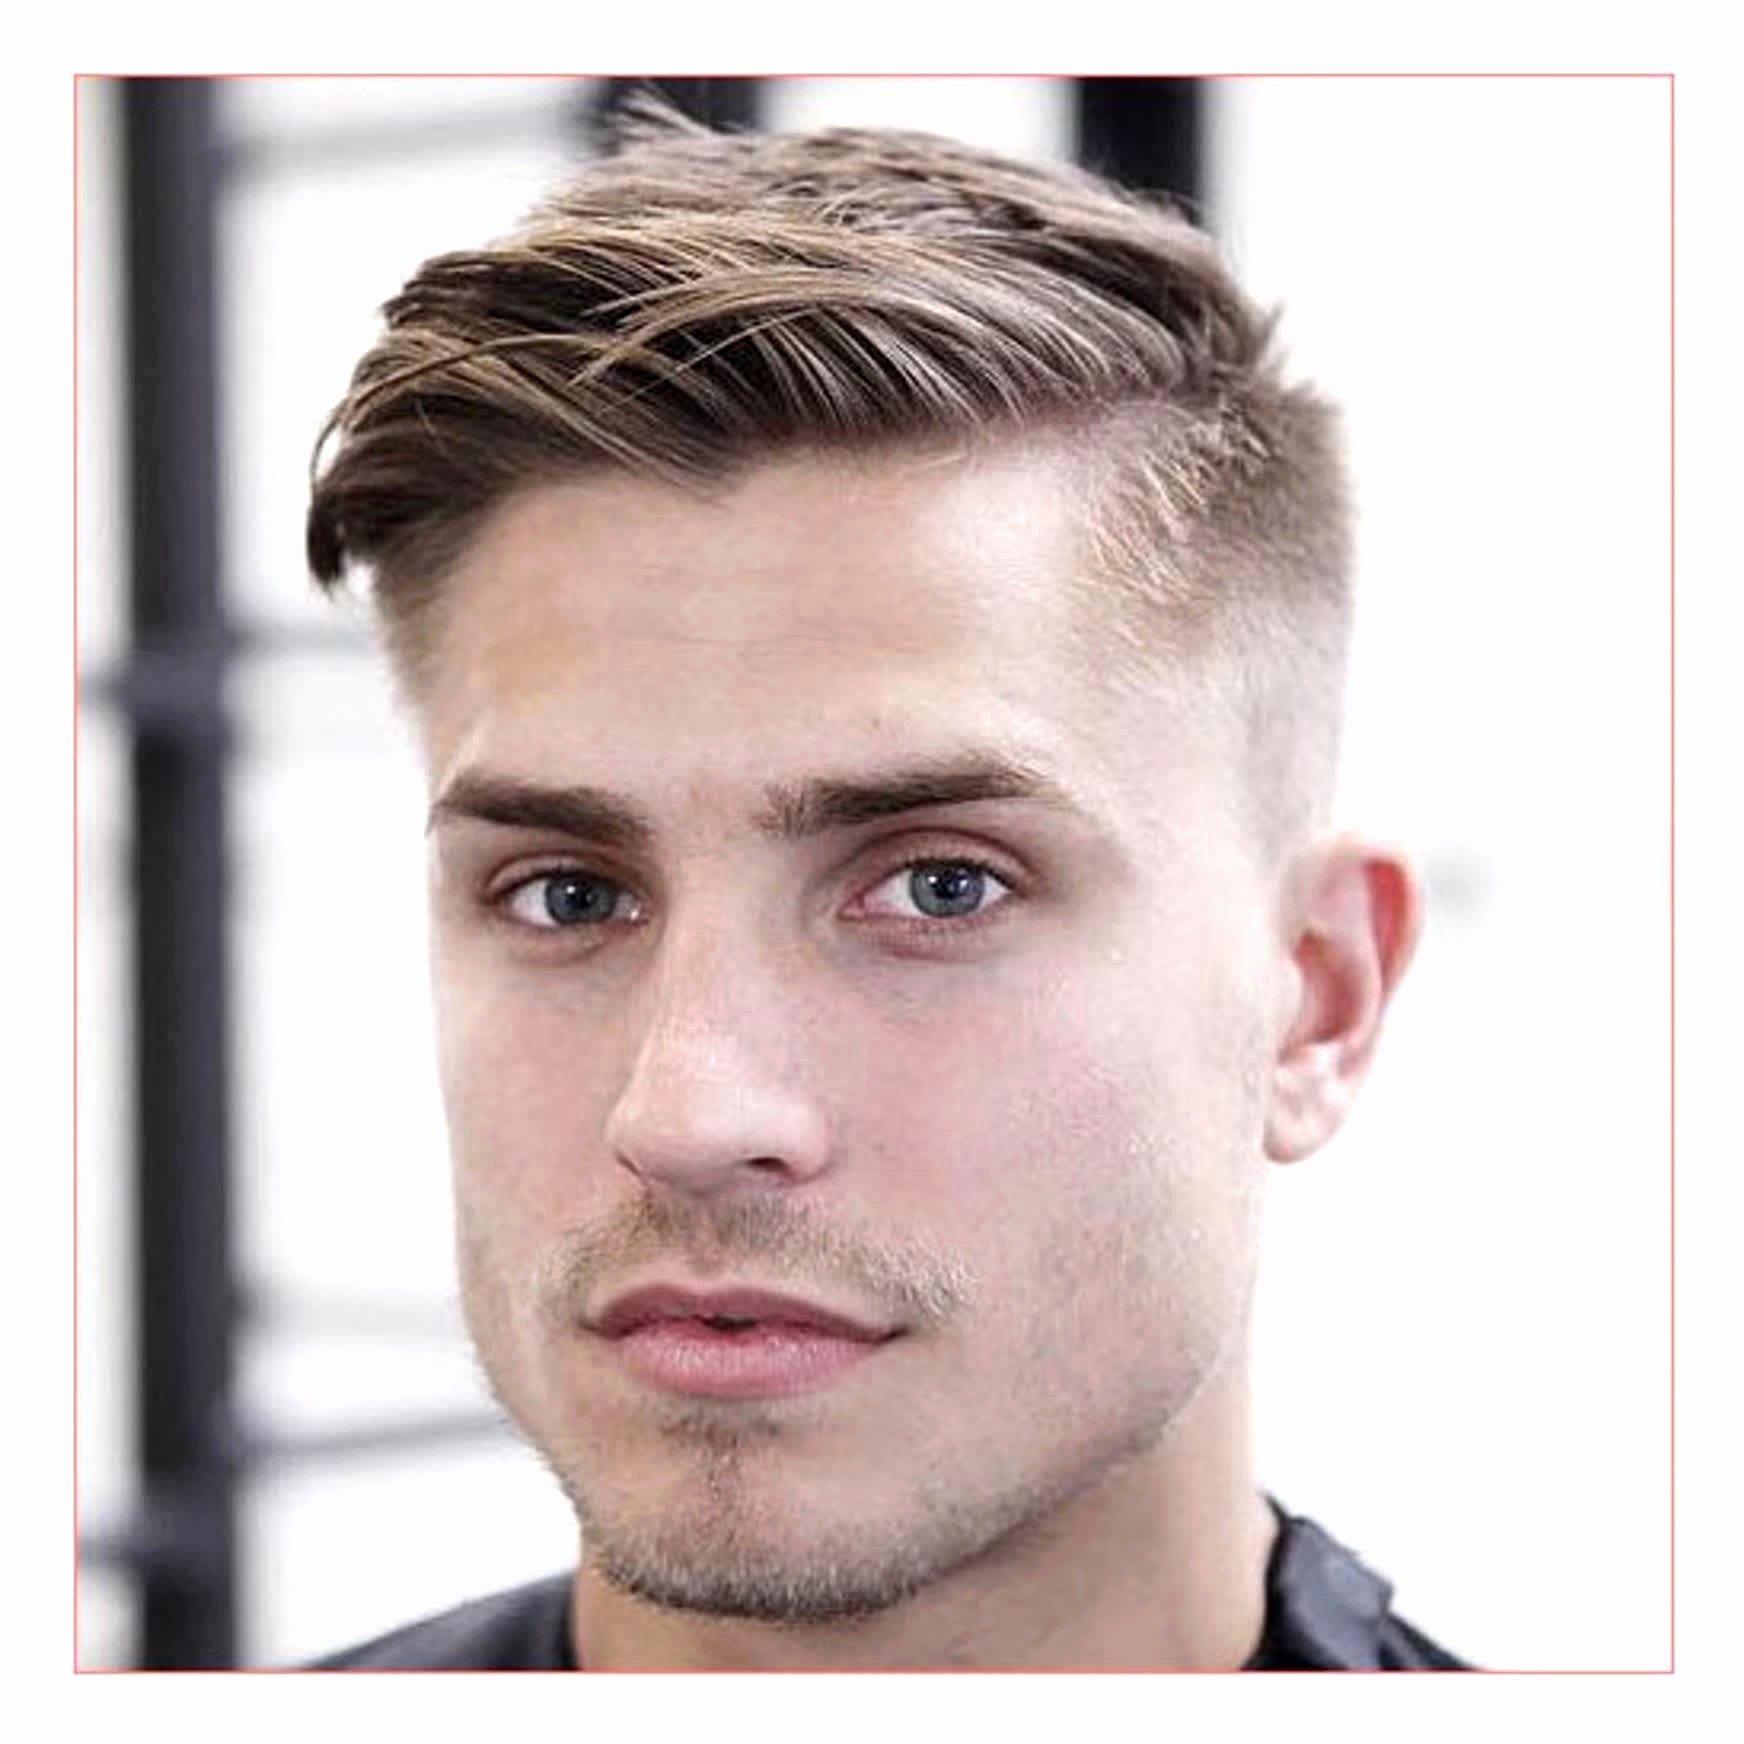 Mens haircuts with receding hairline hairstyles blonde  men  best hair style men  pinterest  hair